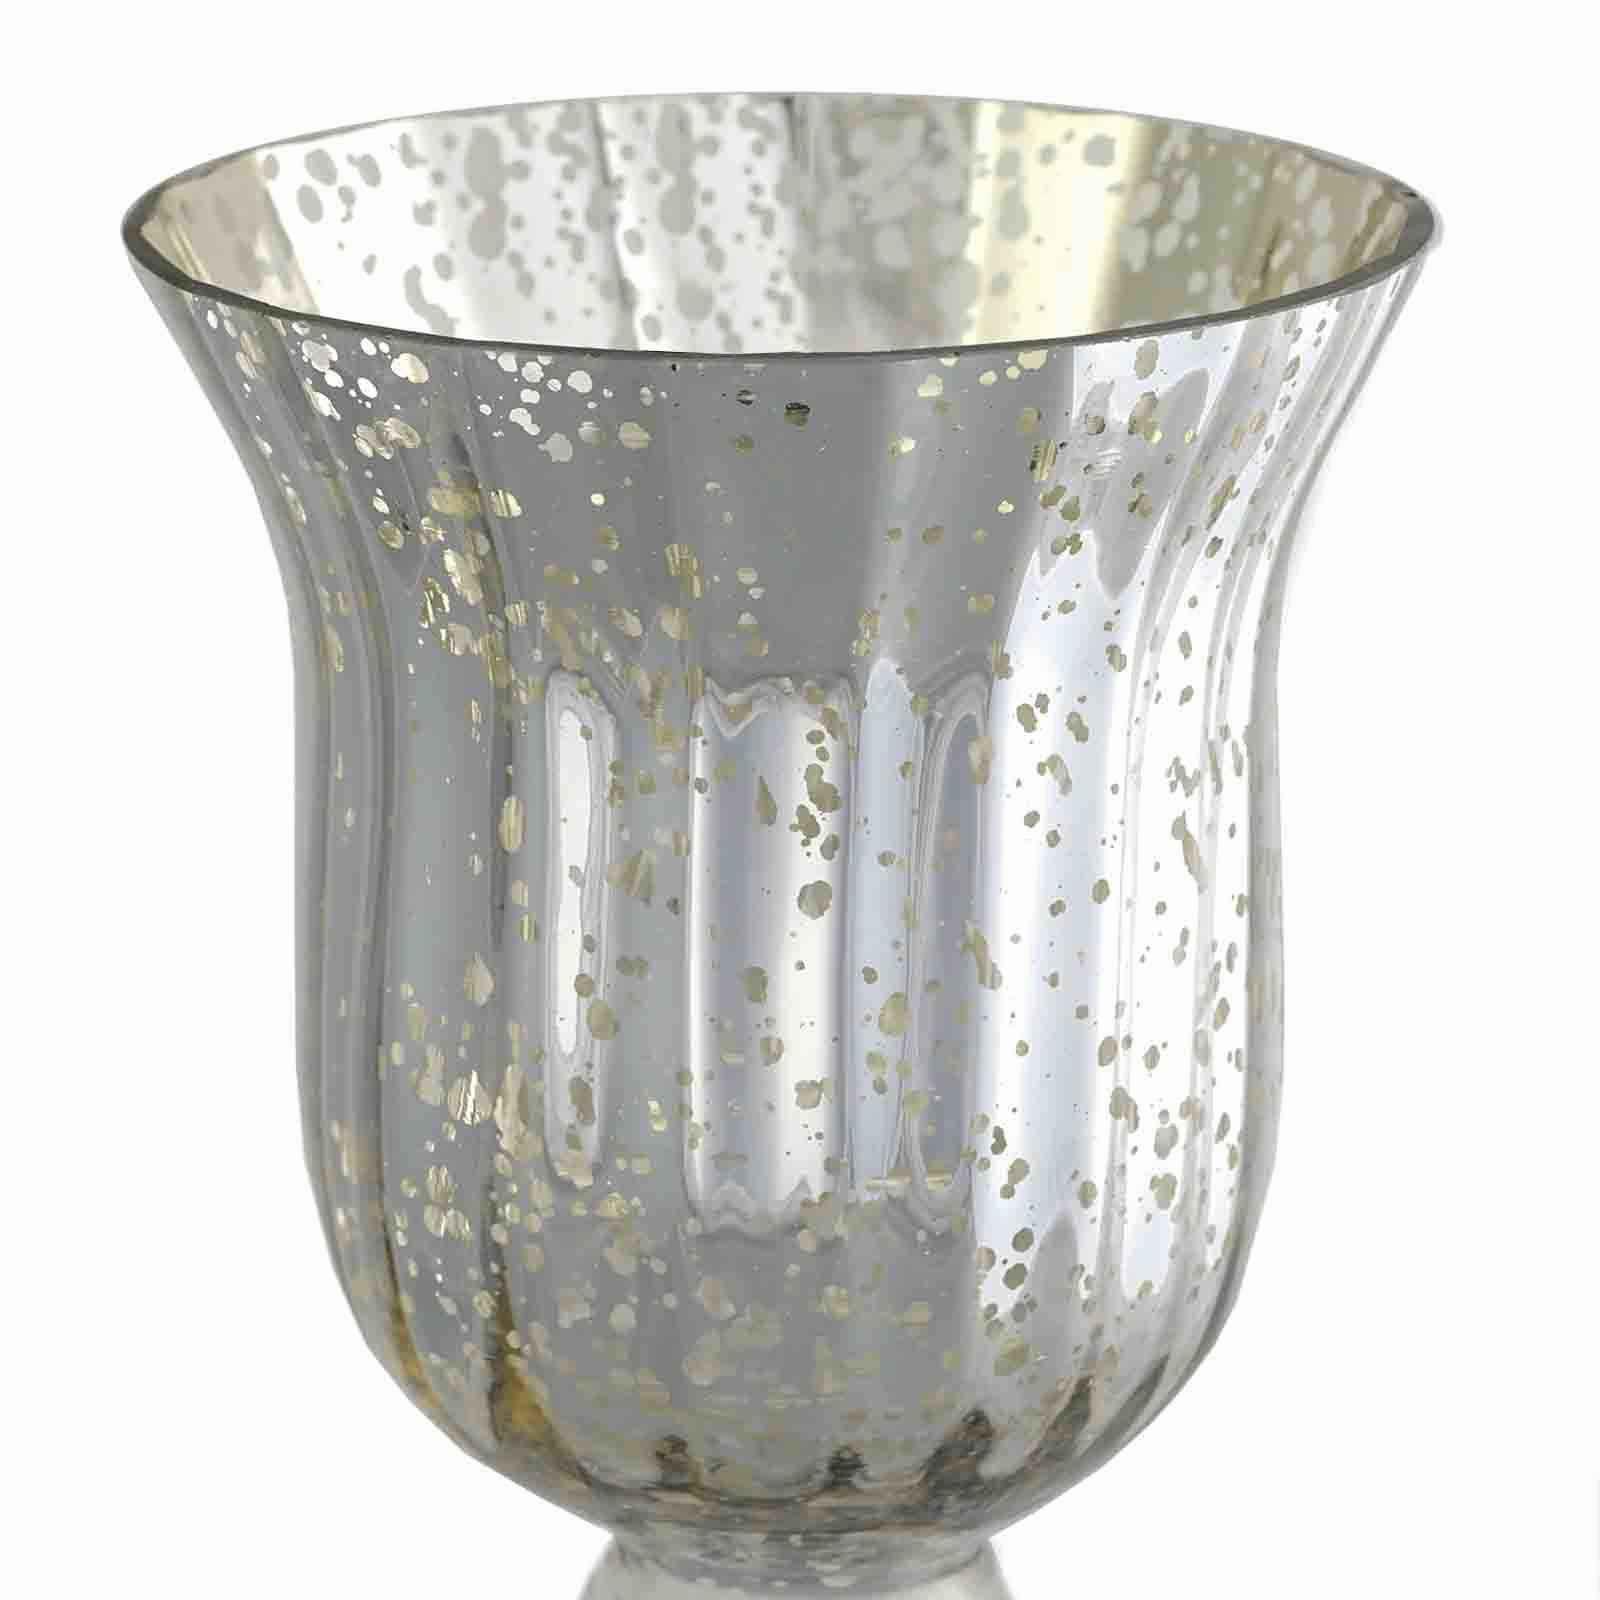 24 inch vases in bulk of candle holder lantern fancy hurricane candle holder 8 1h vases inside wedding candle holders bulk gorgeous pe s5h vases for candlestick holder bulk